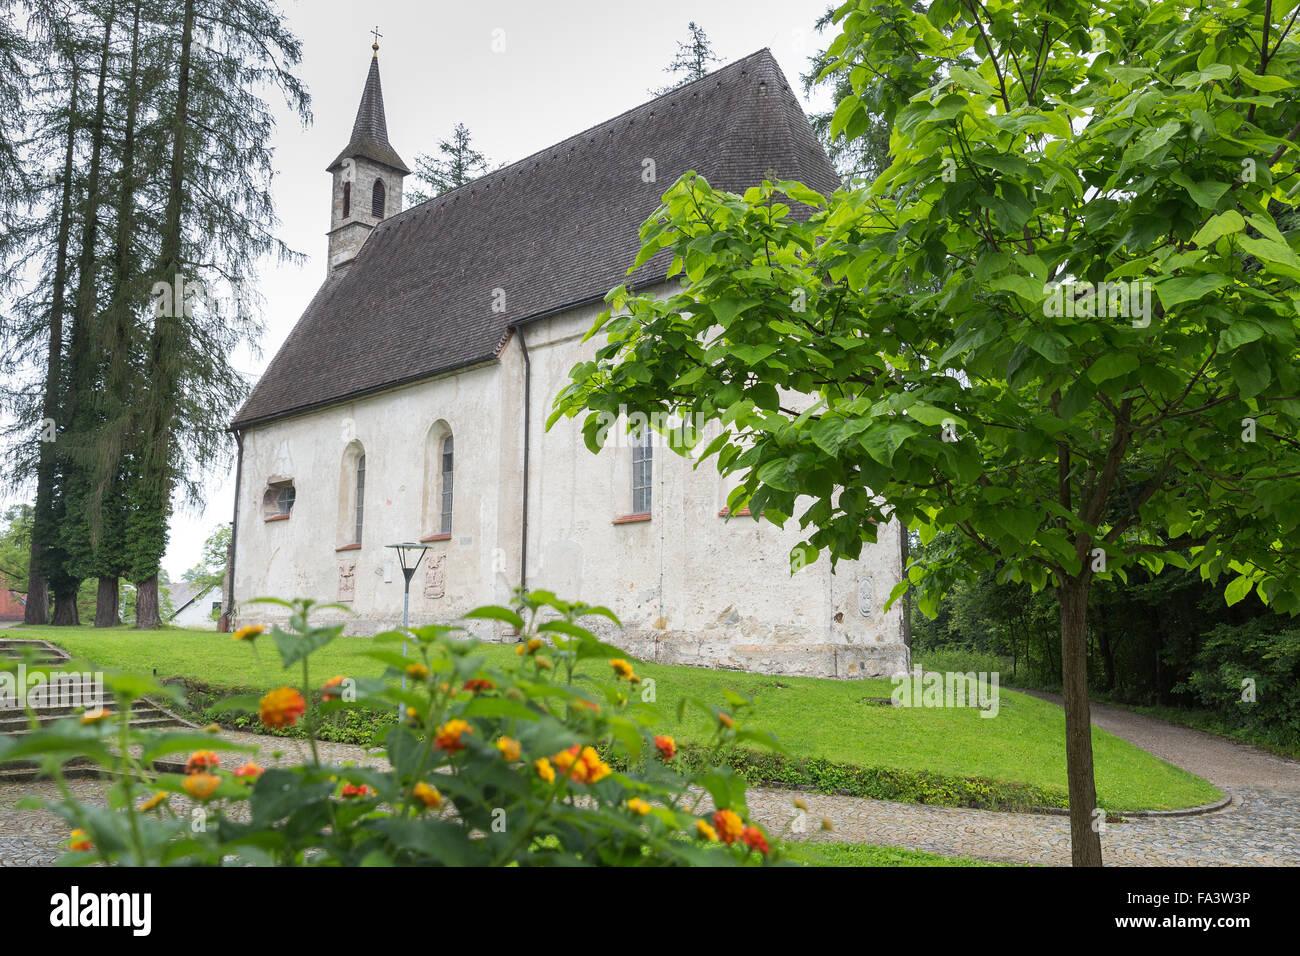 Herreninsel, Chiemsee, Germany, lake, water, boat trip, tourism, travel, island, church, - Stock Image